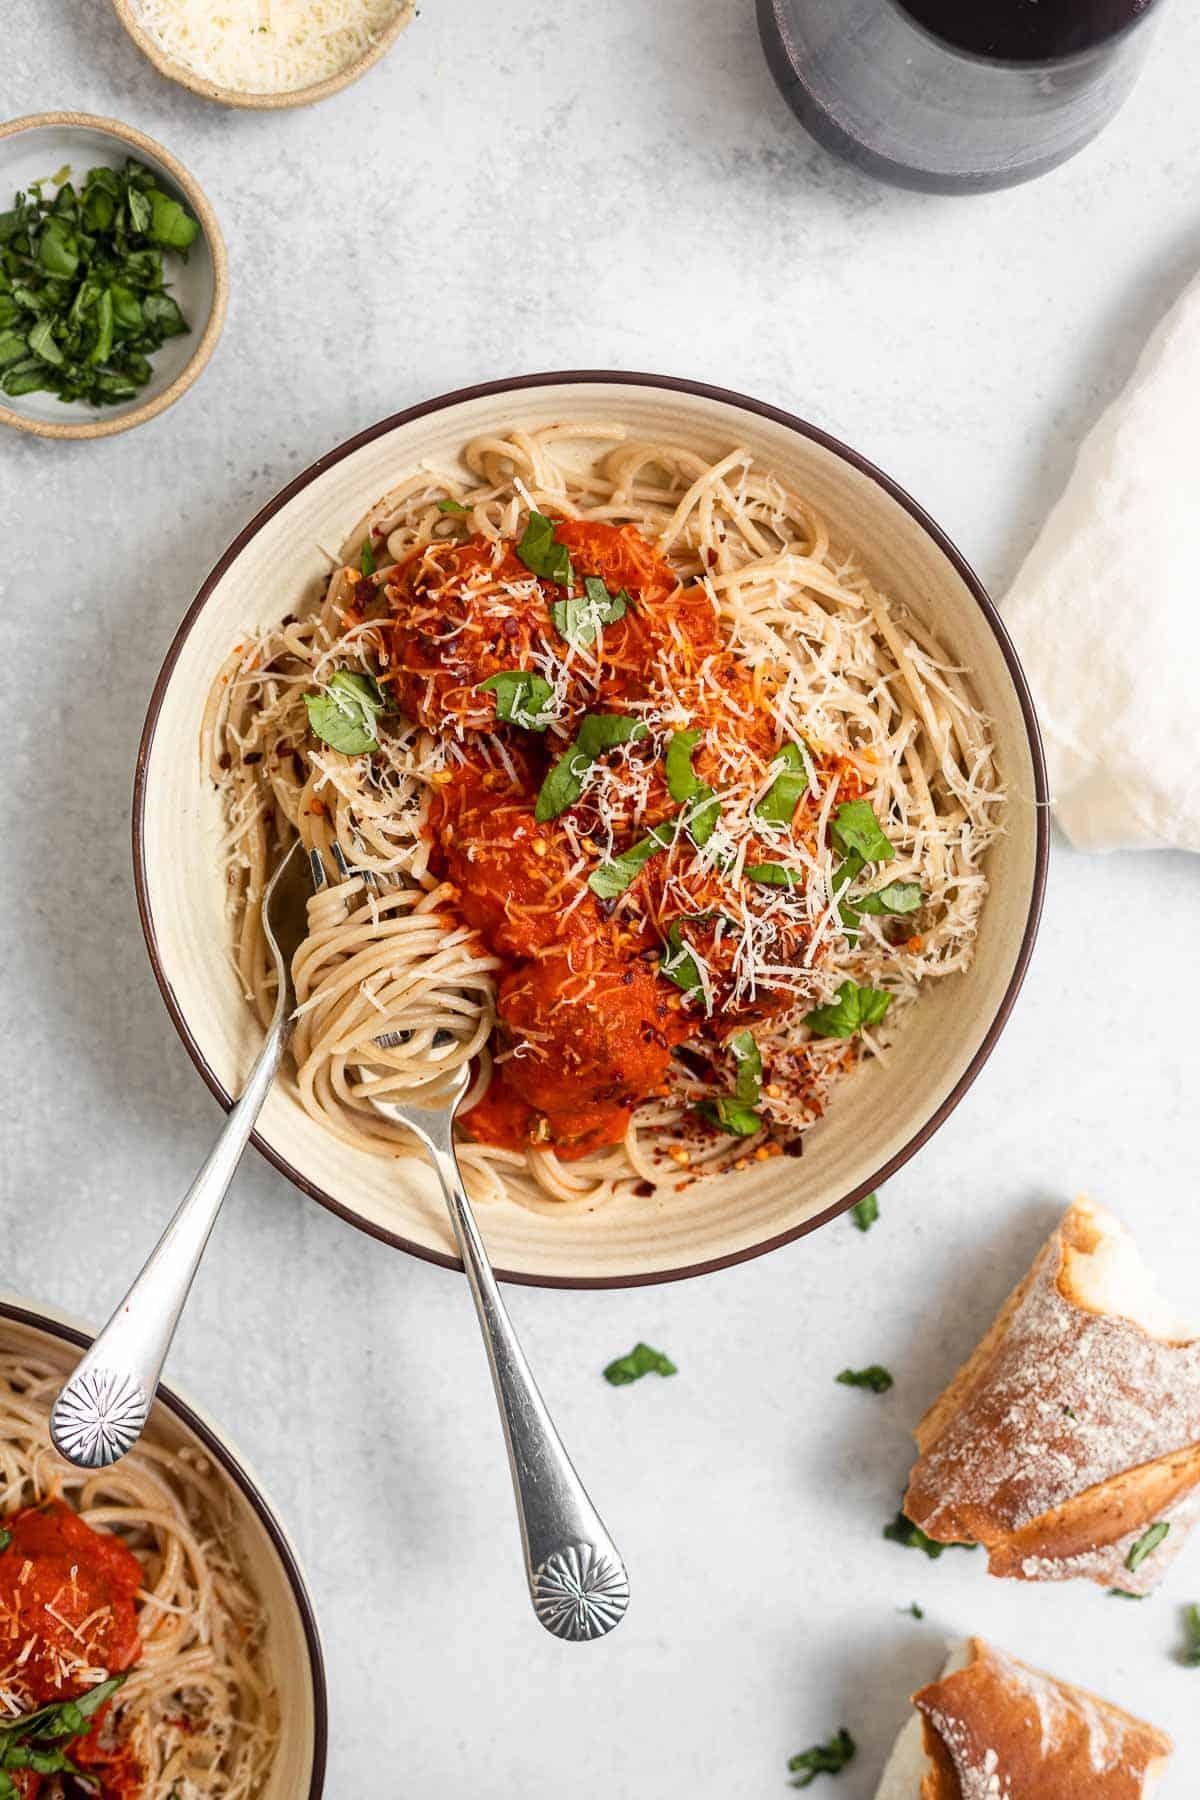 vegan lentil meatballs in a bowl with spaghetti